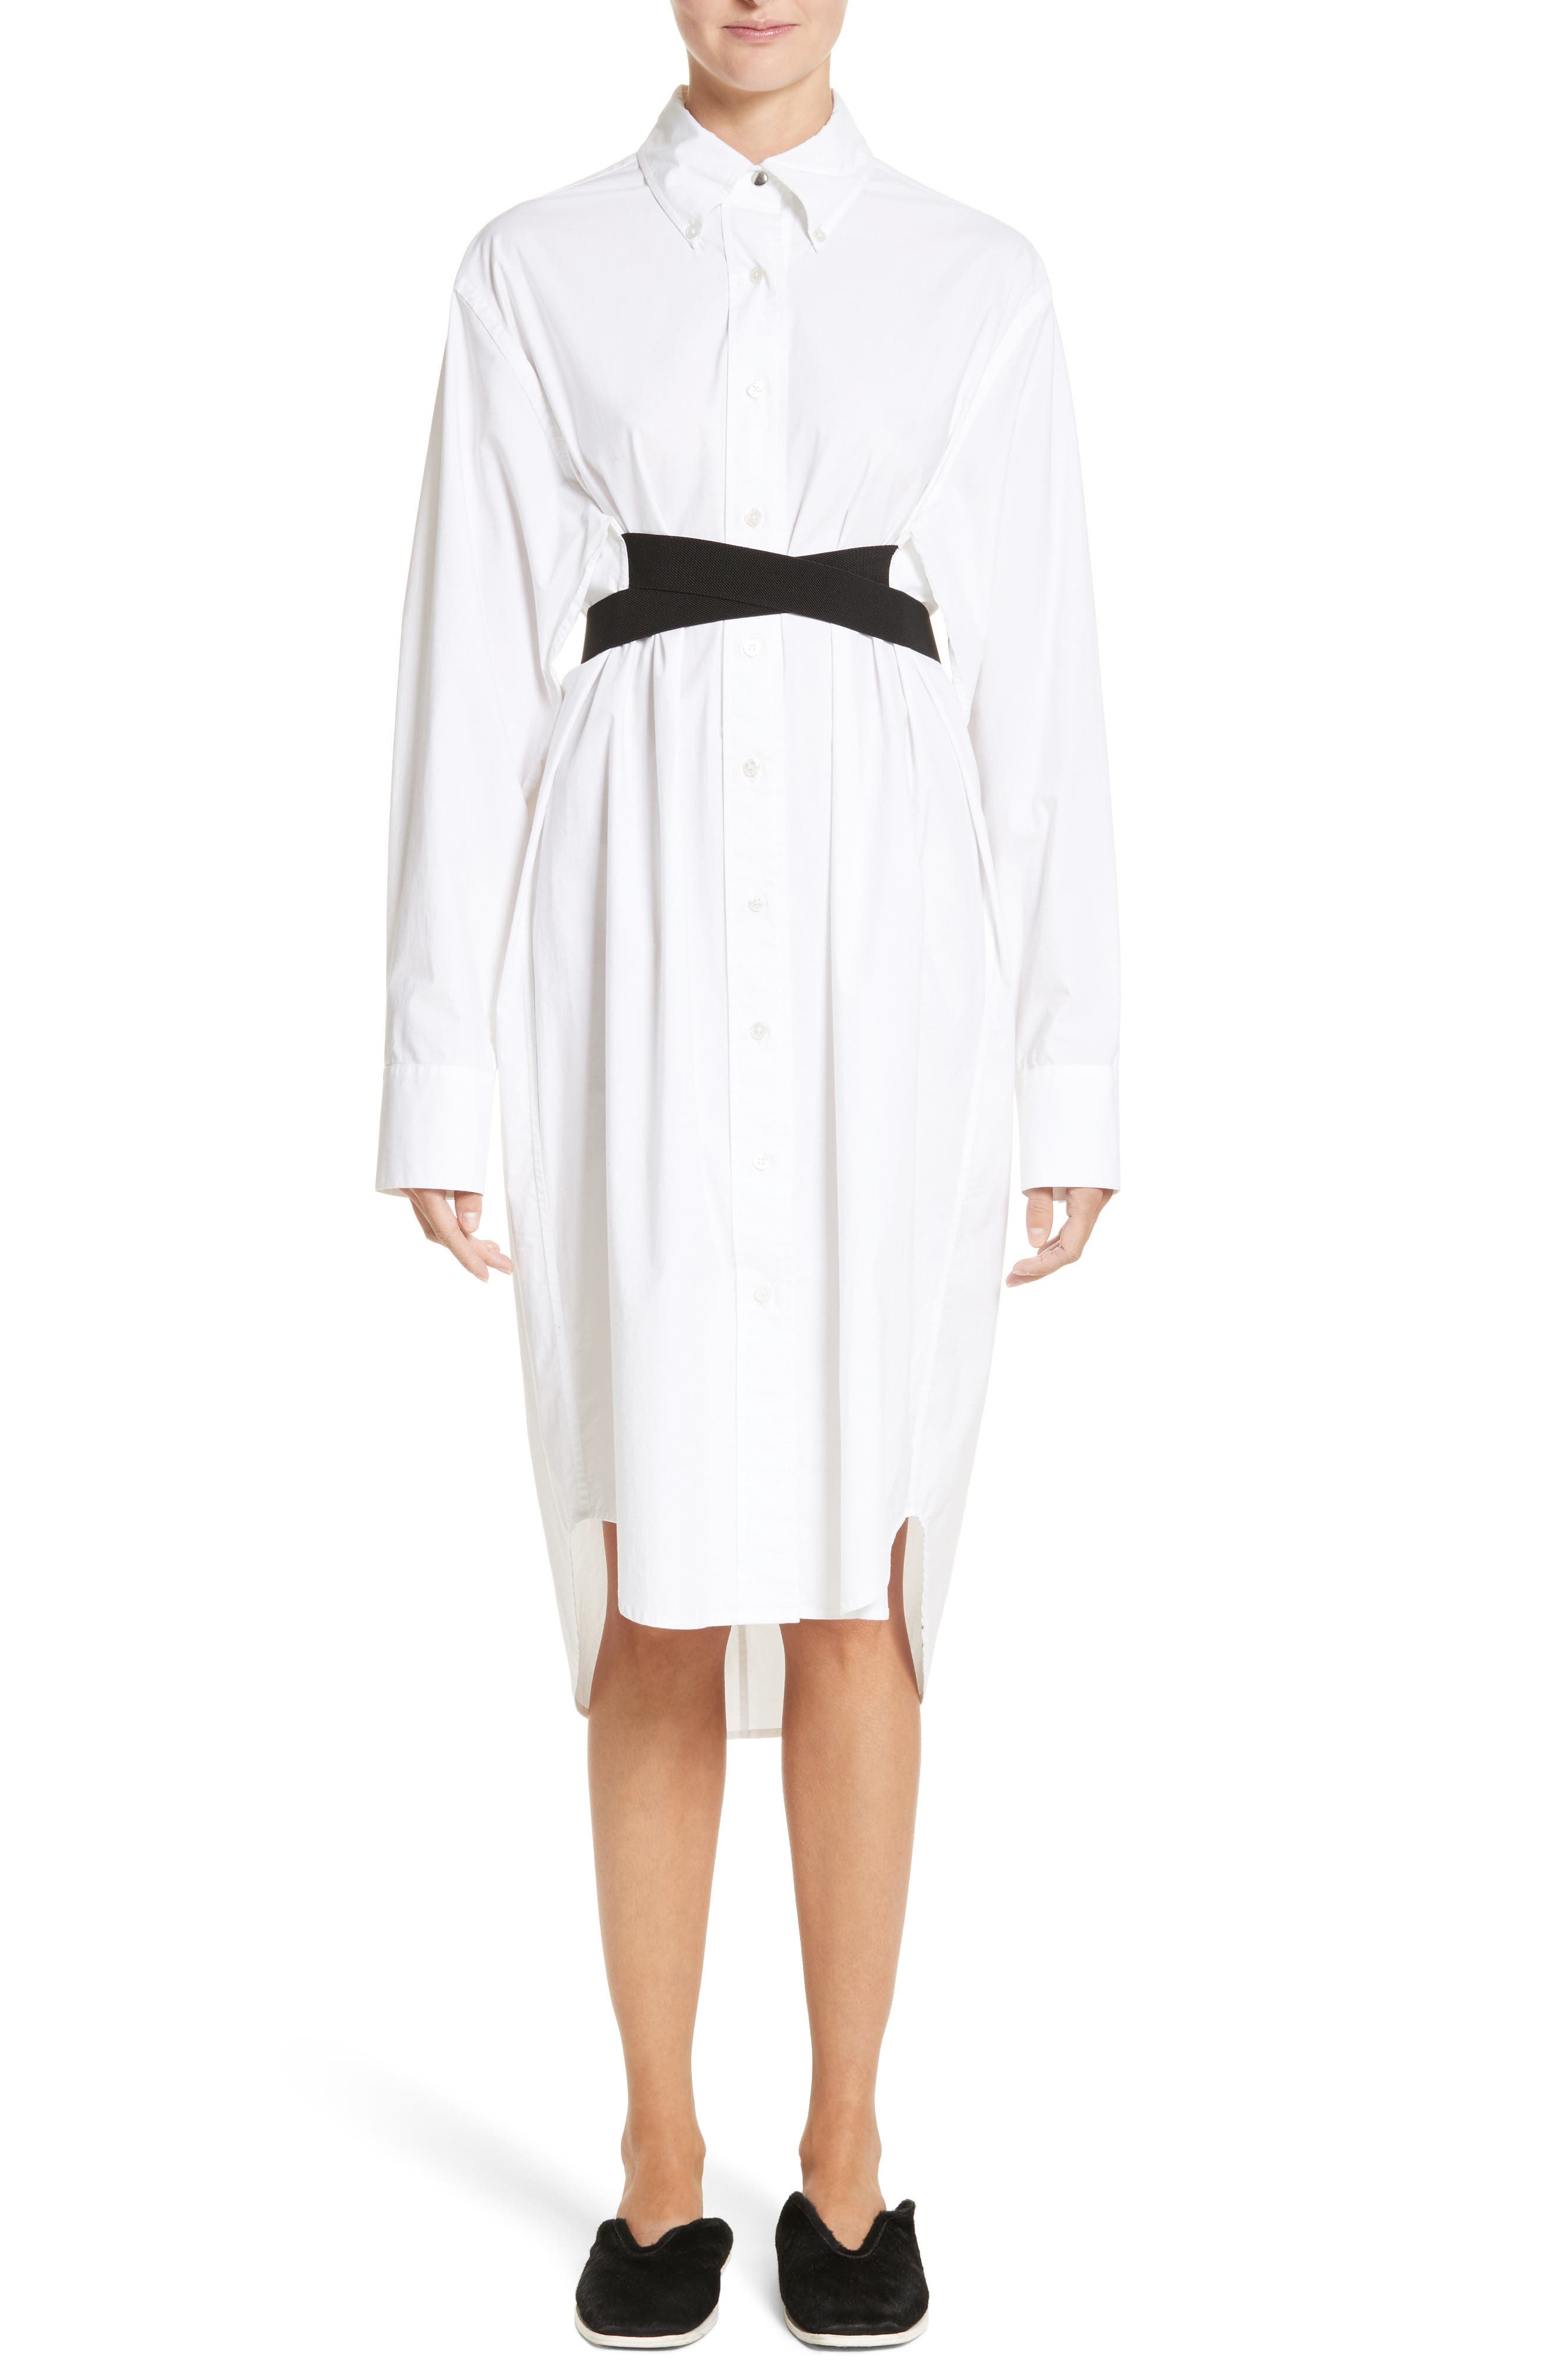 PSWL Belted Poplin Shirtdress,                         Main,                         color, Optic White/ Black